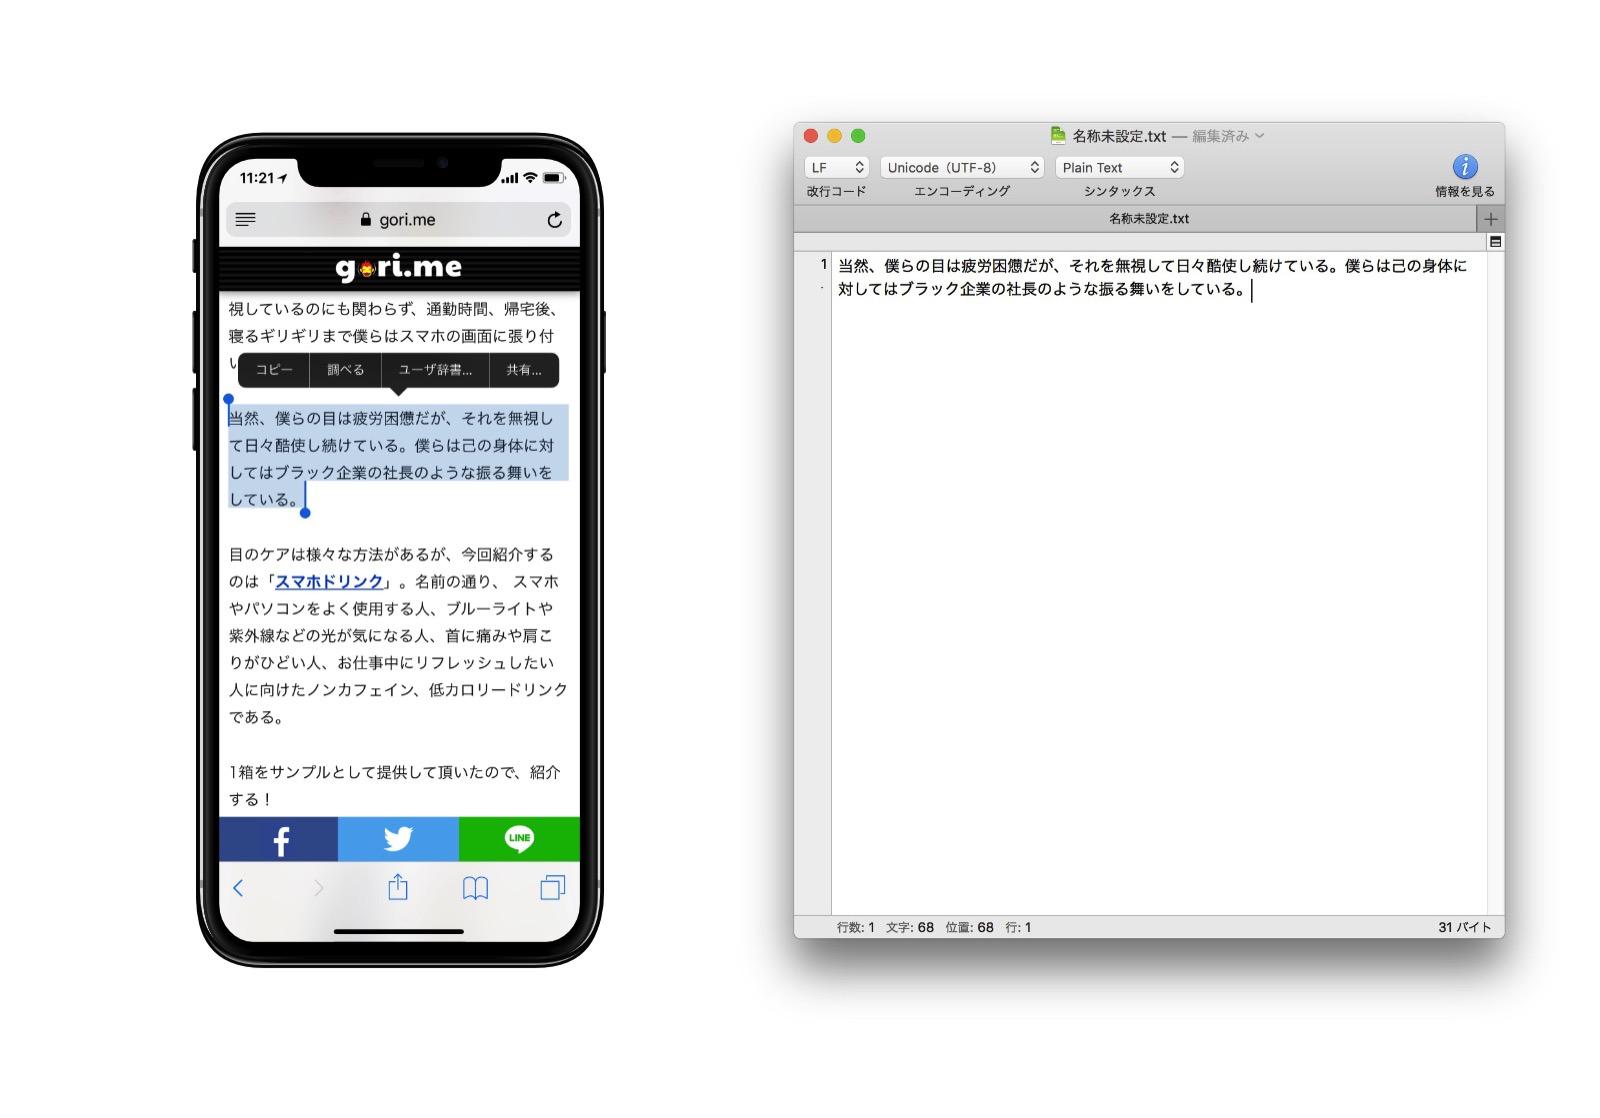 ios-macos-universal-clipboard.jpg